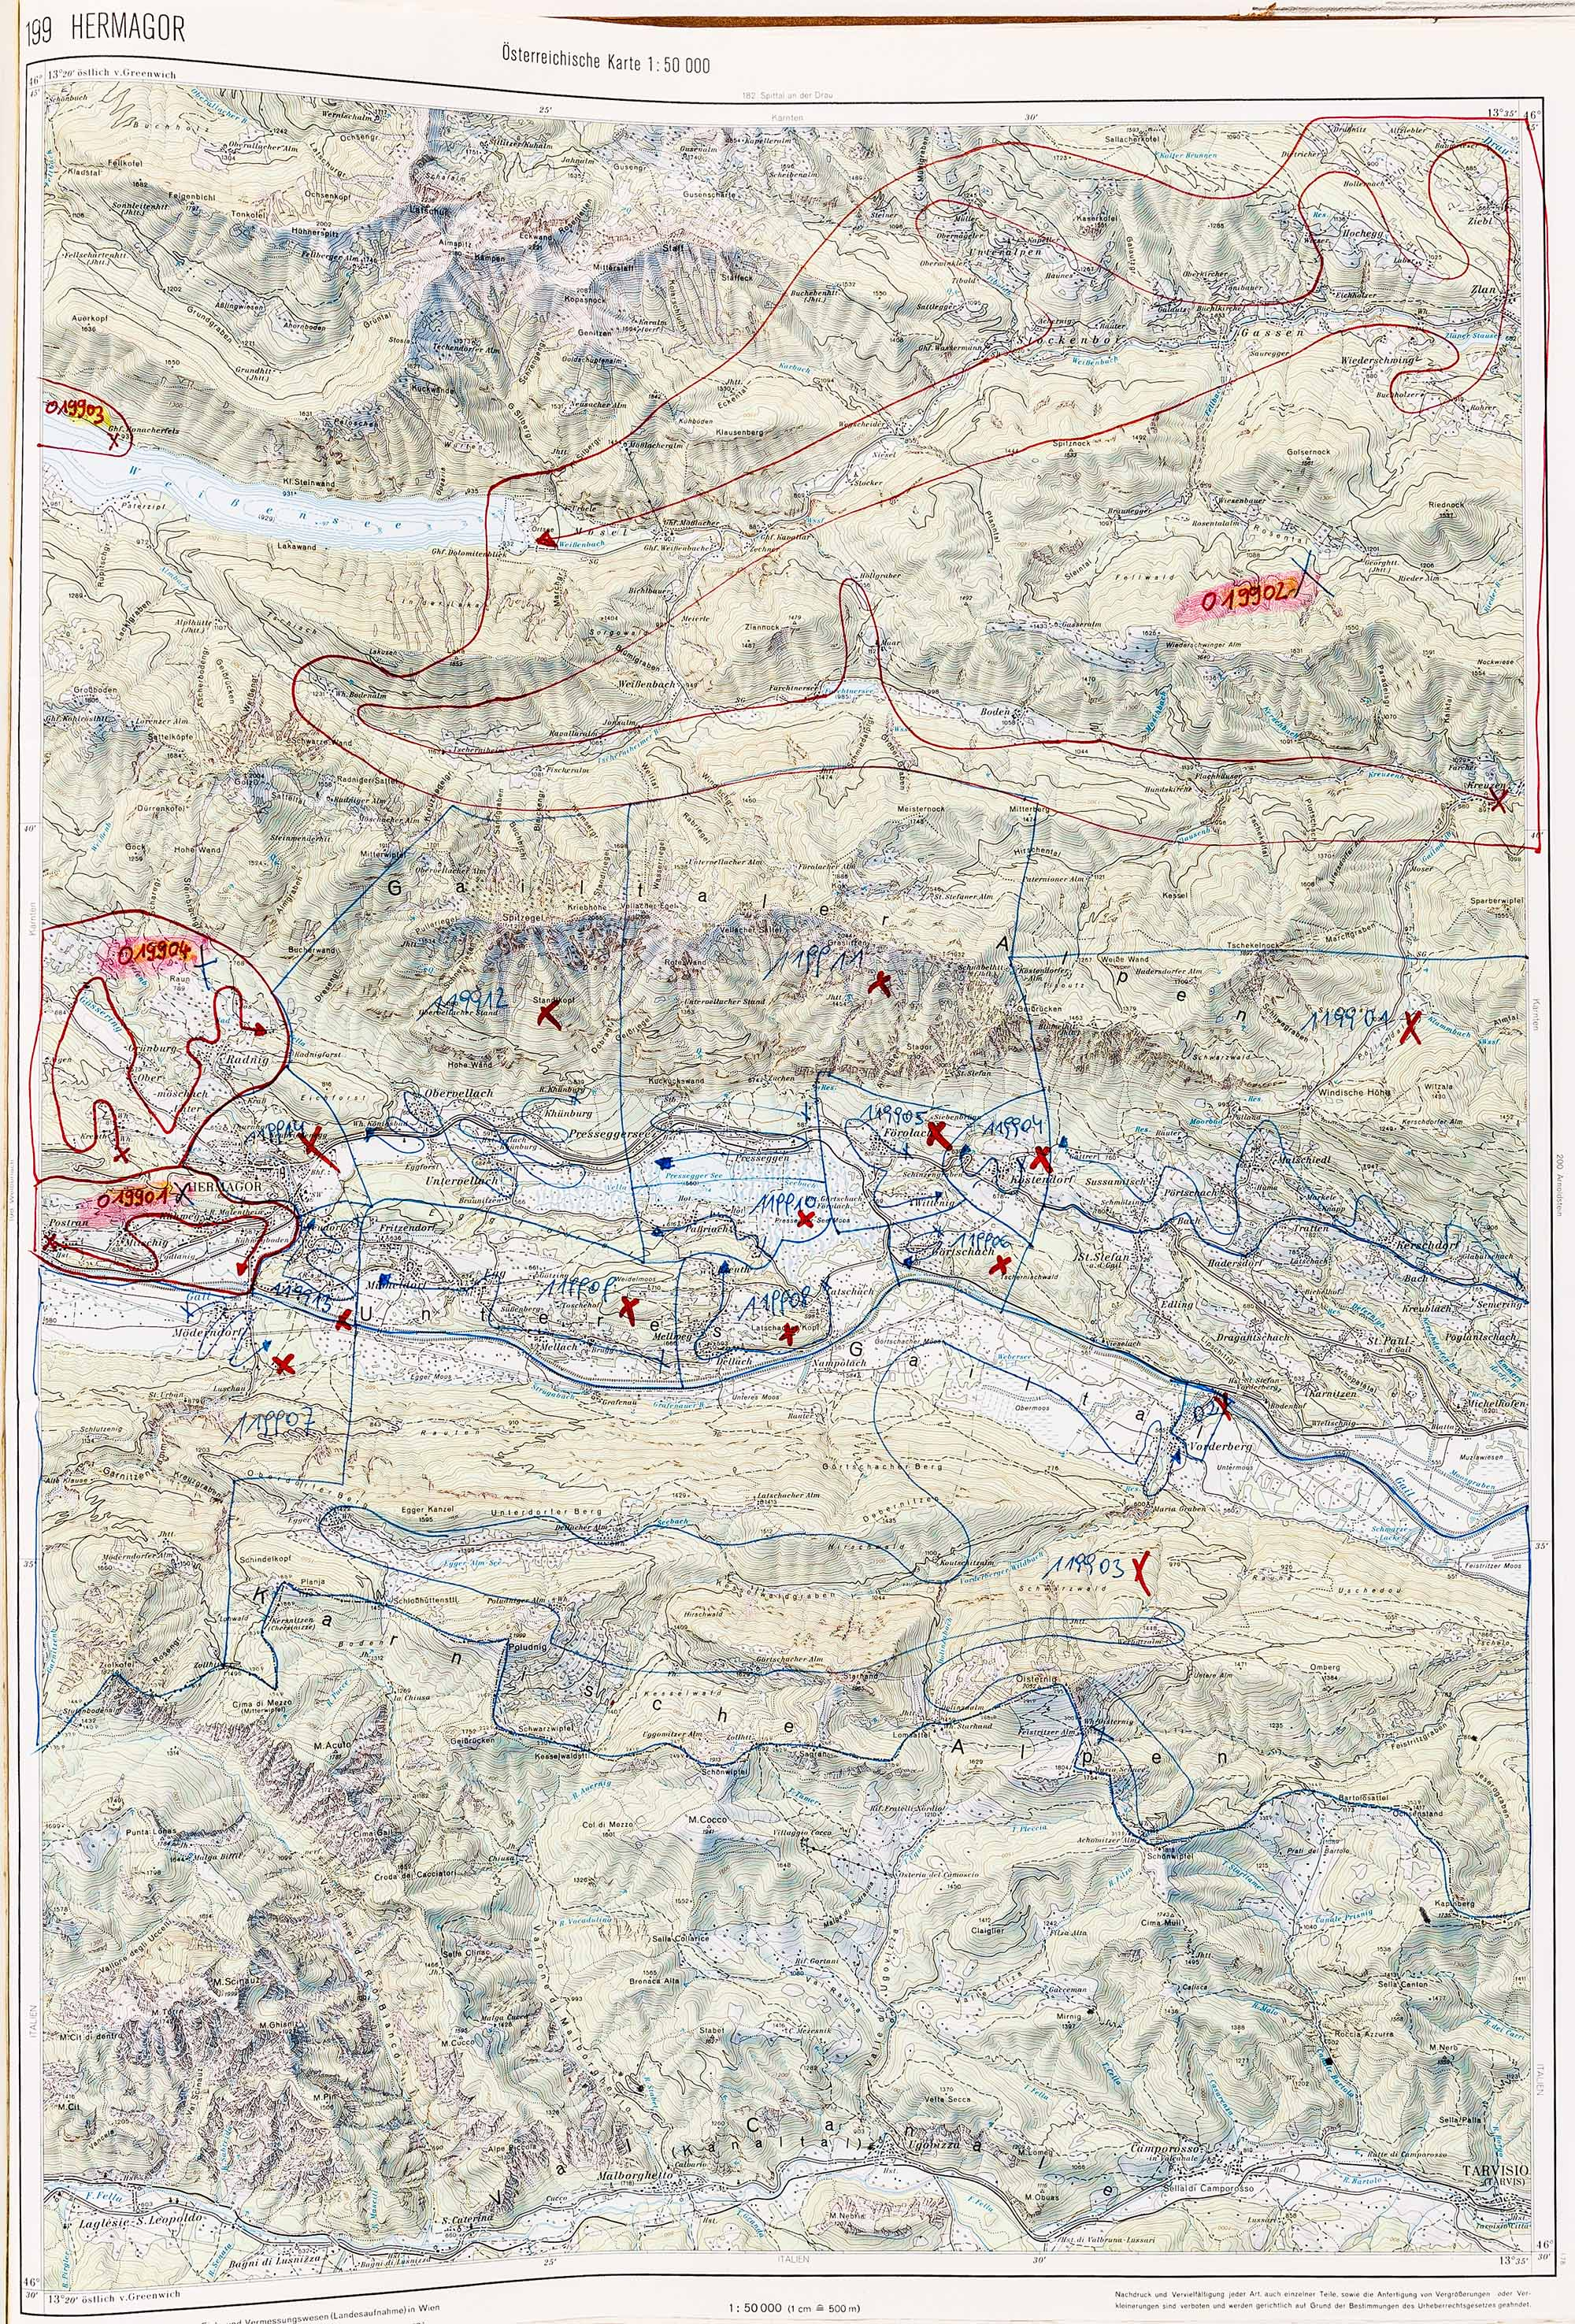 1979-1982 Karte 199